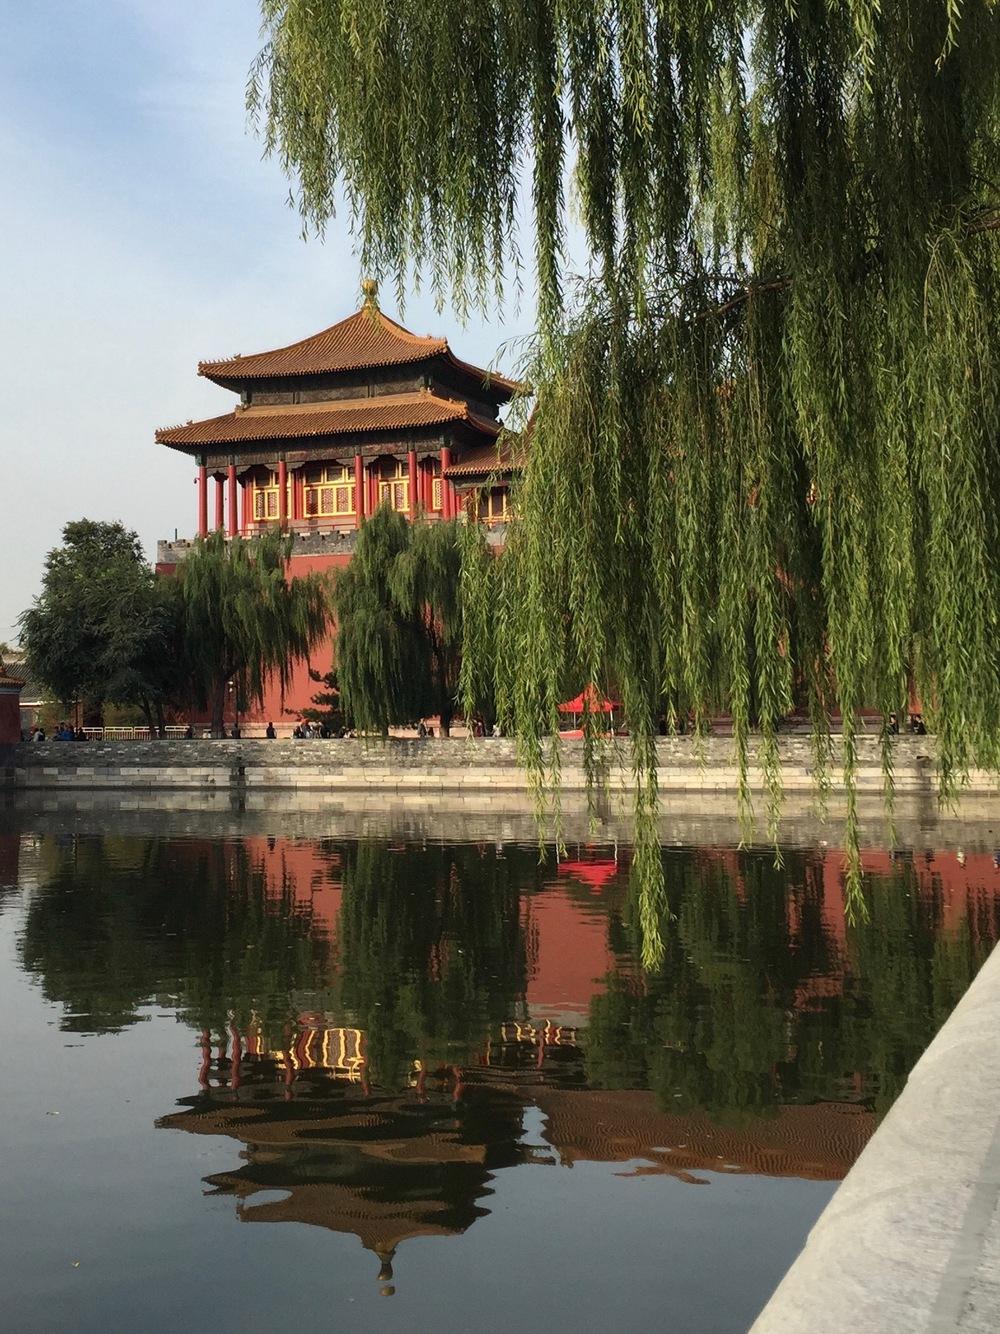 Moat around Forbidden City.